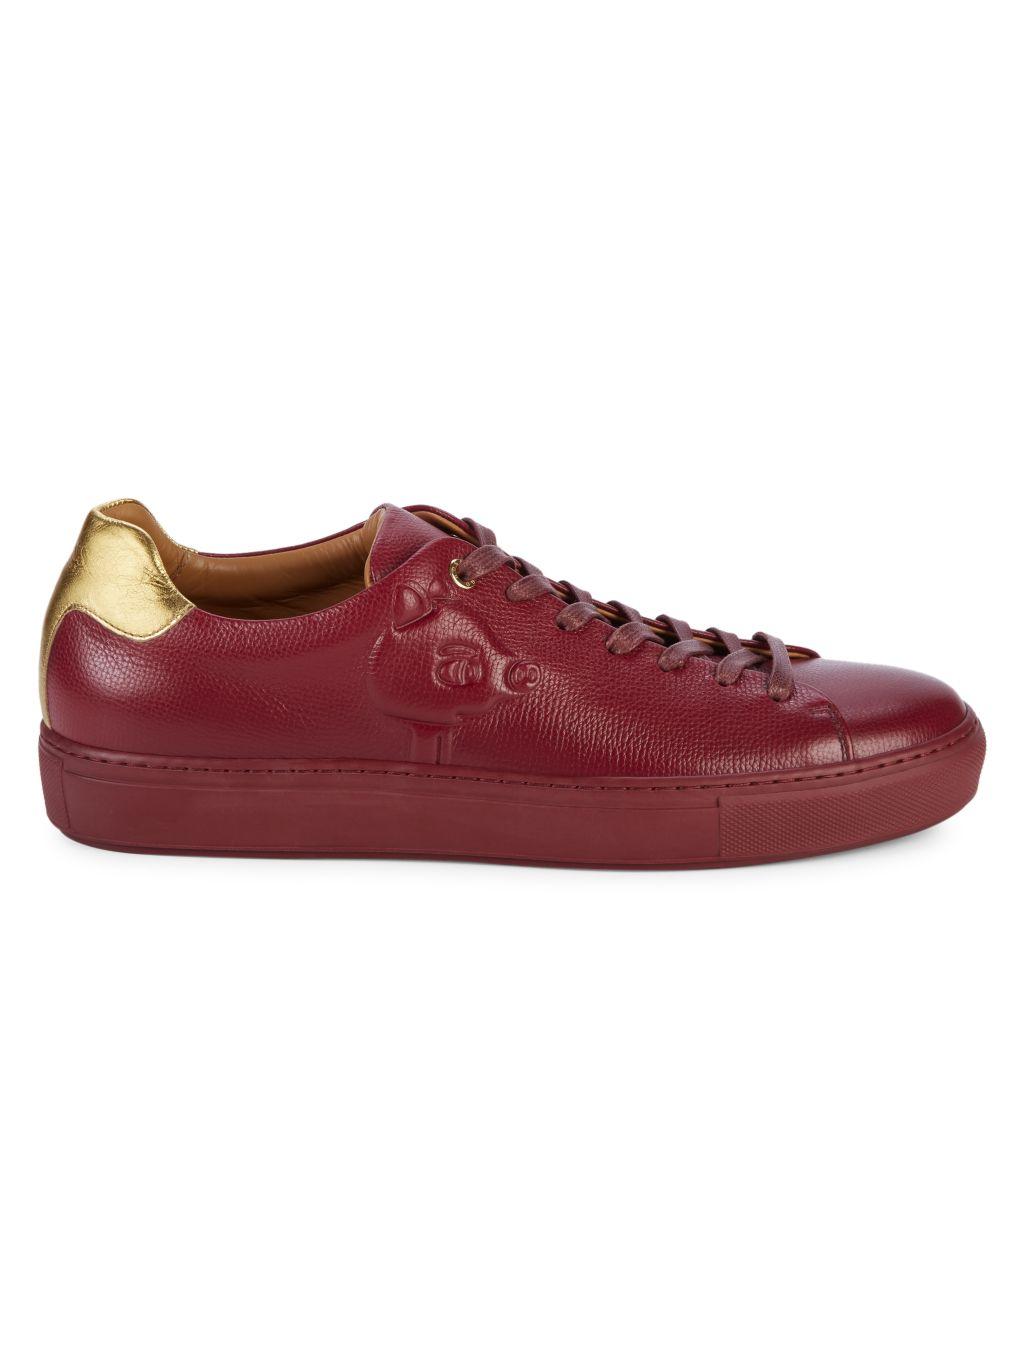 Boss Hugo Boss Low-Top Leather Sneakers